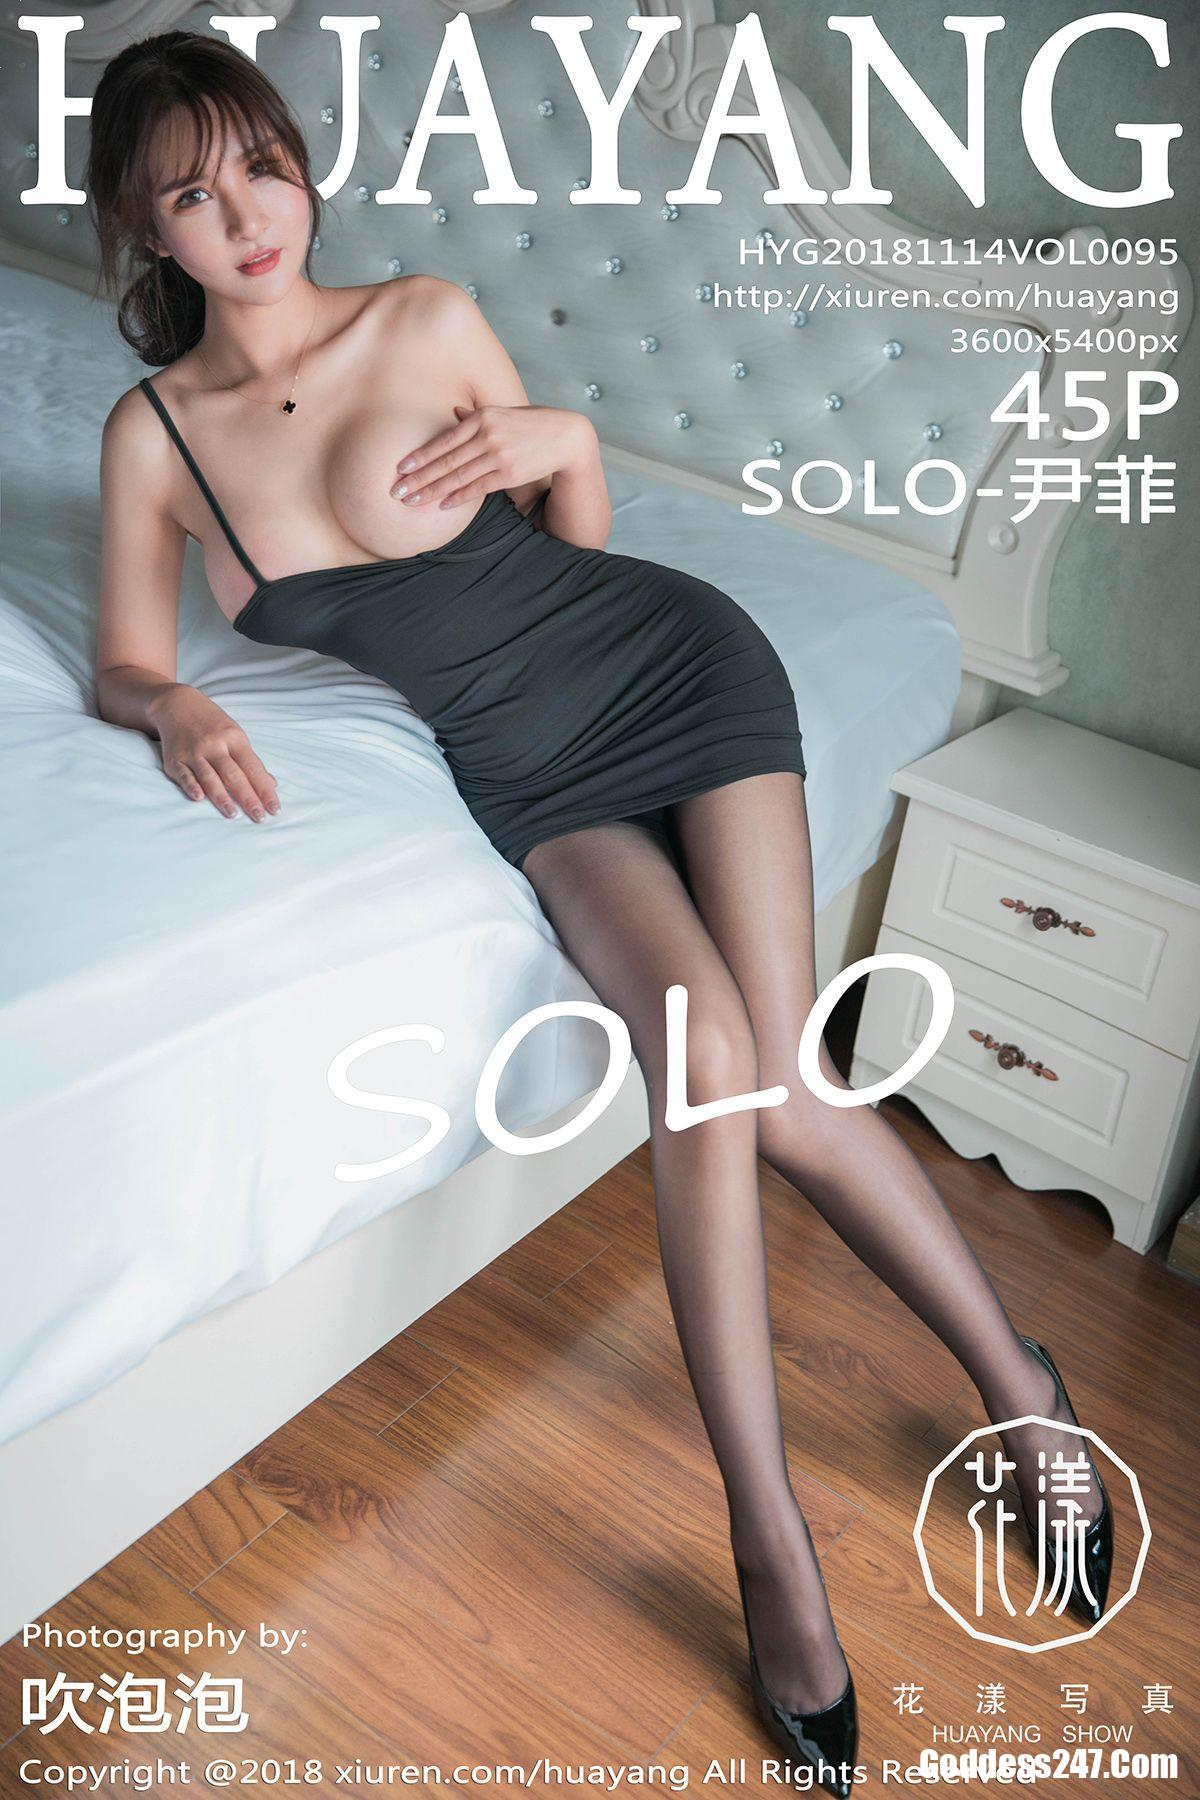 HuaYang 花漾show Vol.095 SOLO-尹菲